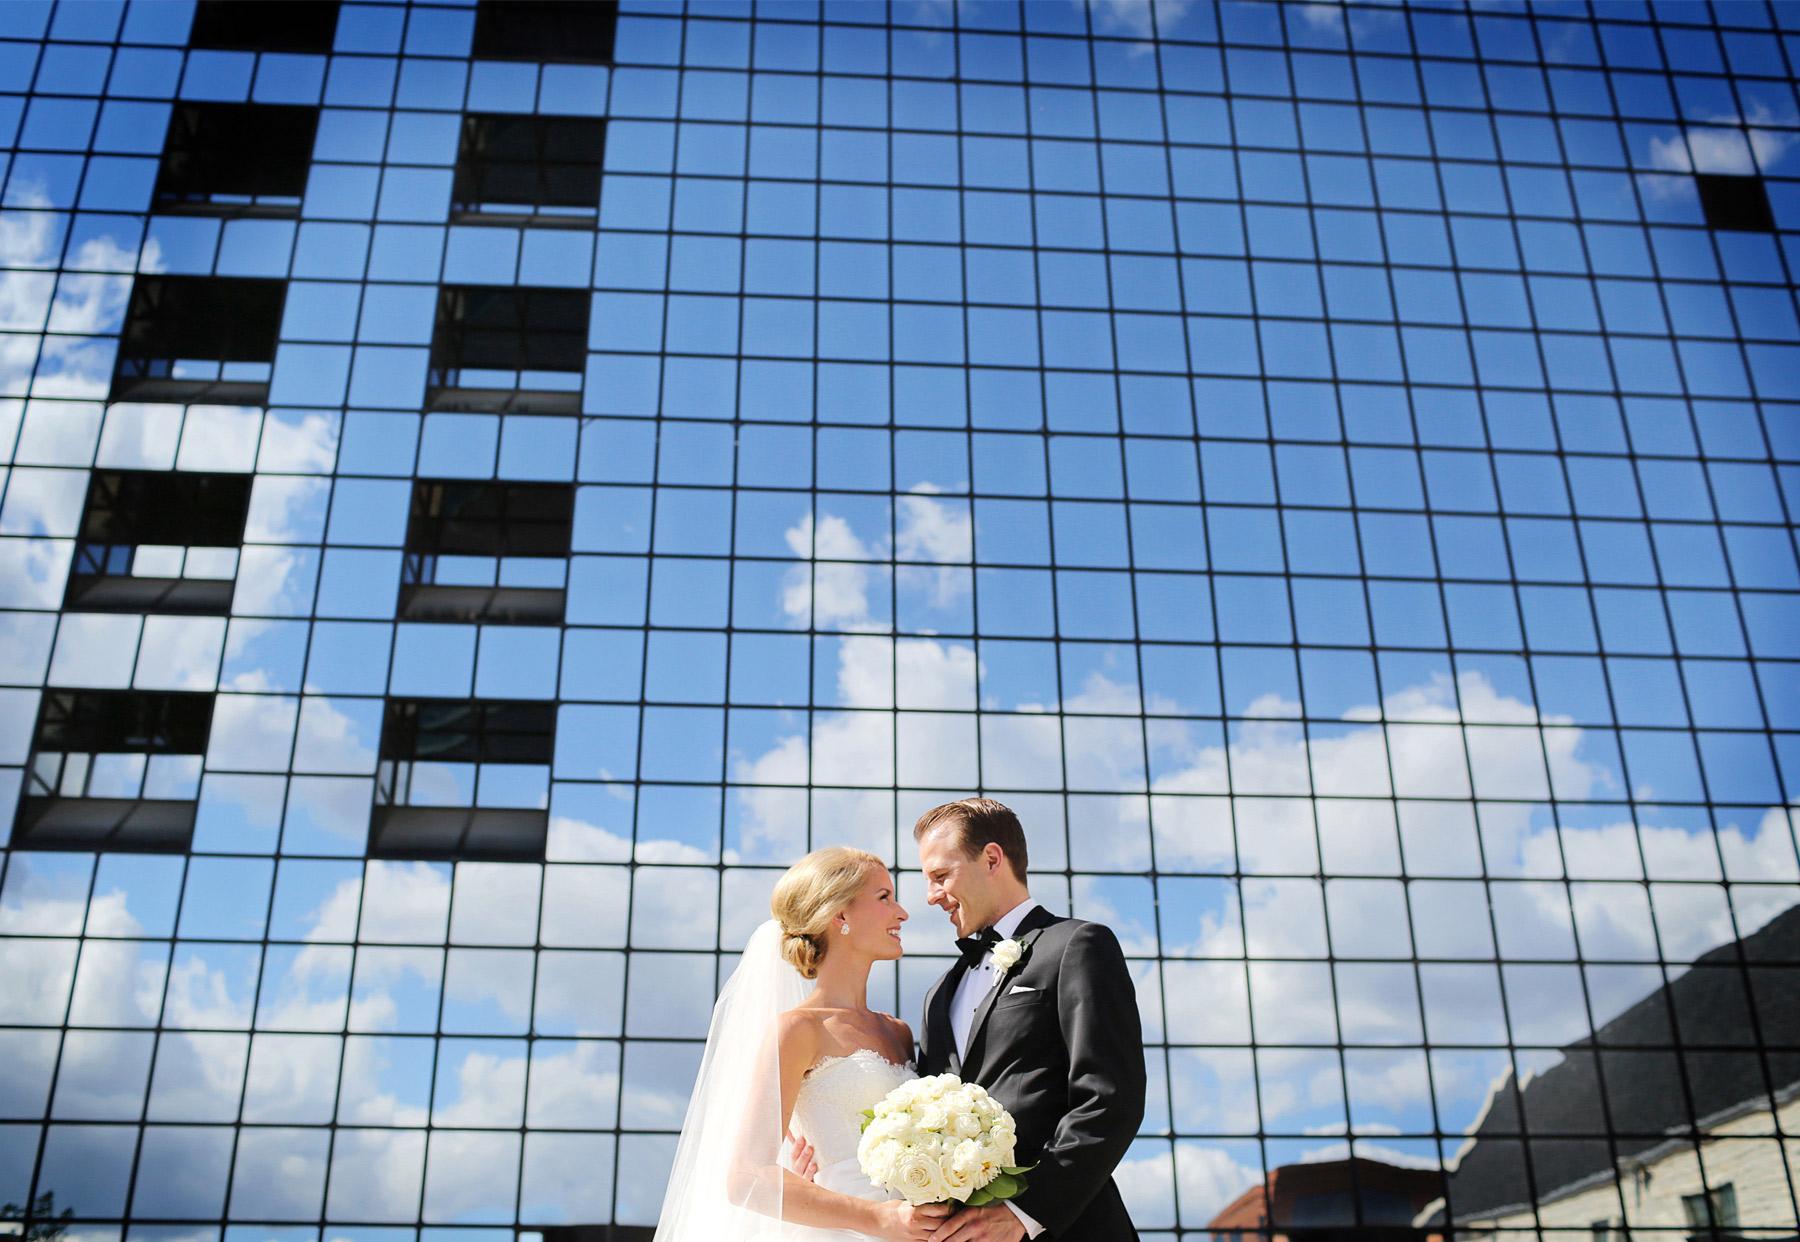 10-Minneapolis-Minnesota-Wedding-Photography-by-Vick-Photography-Downtown-Sarah-&-Brett.jpg